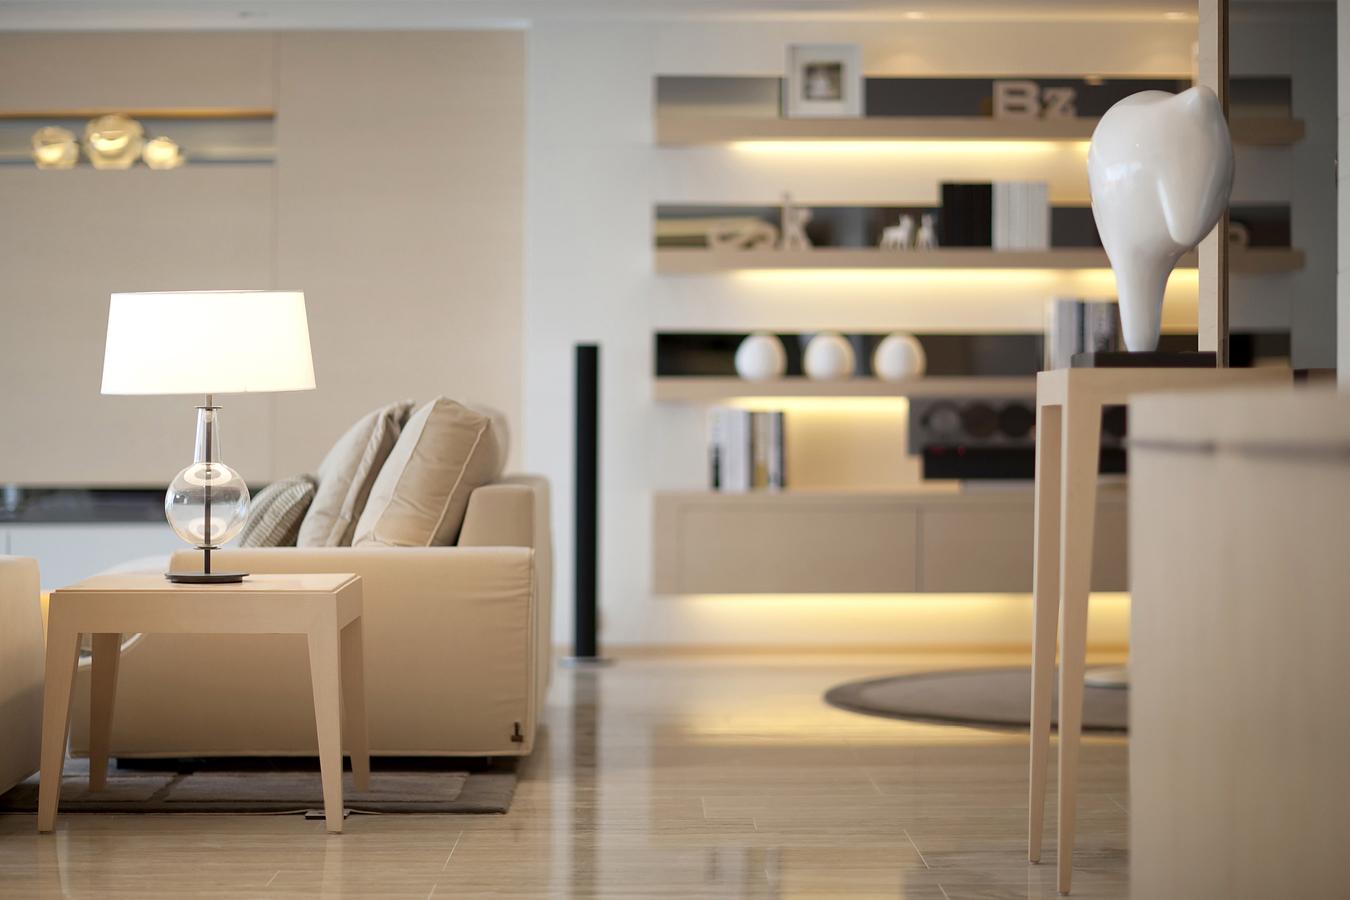 luxury interior-014.png